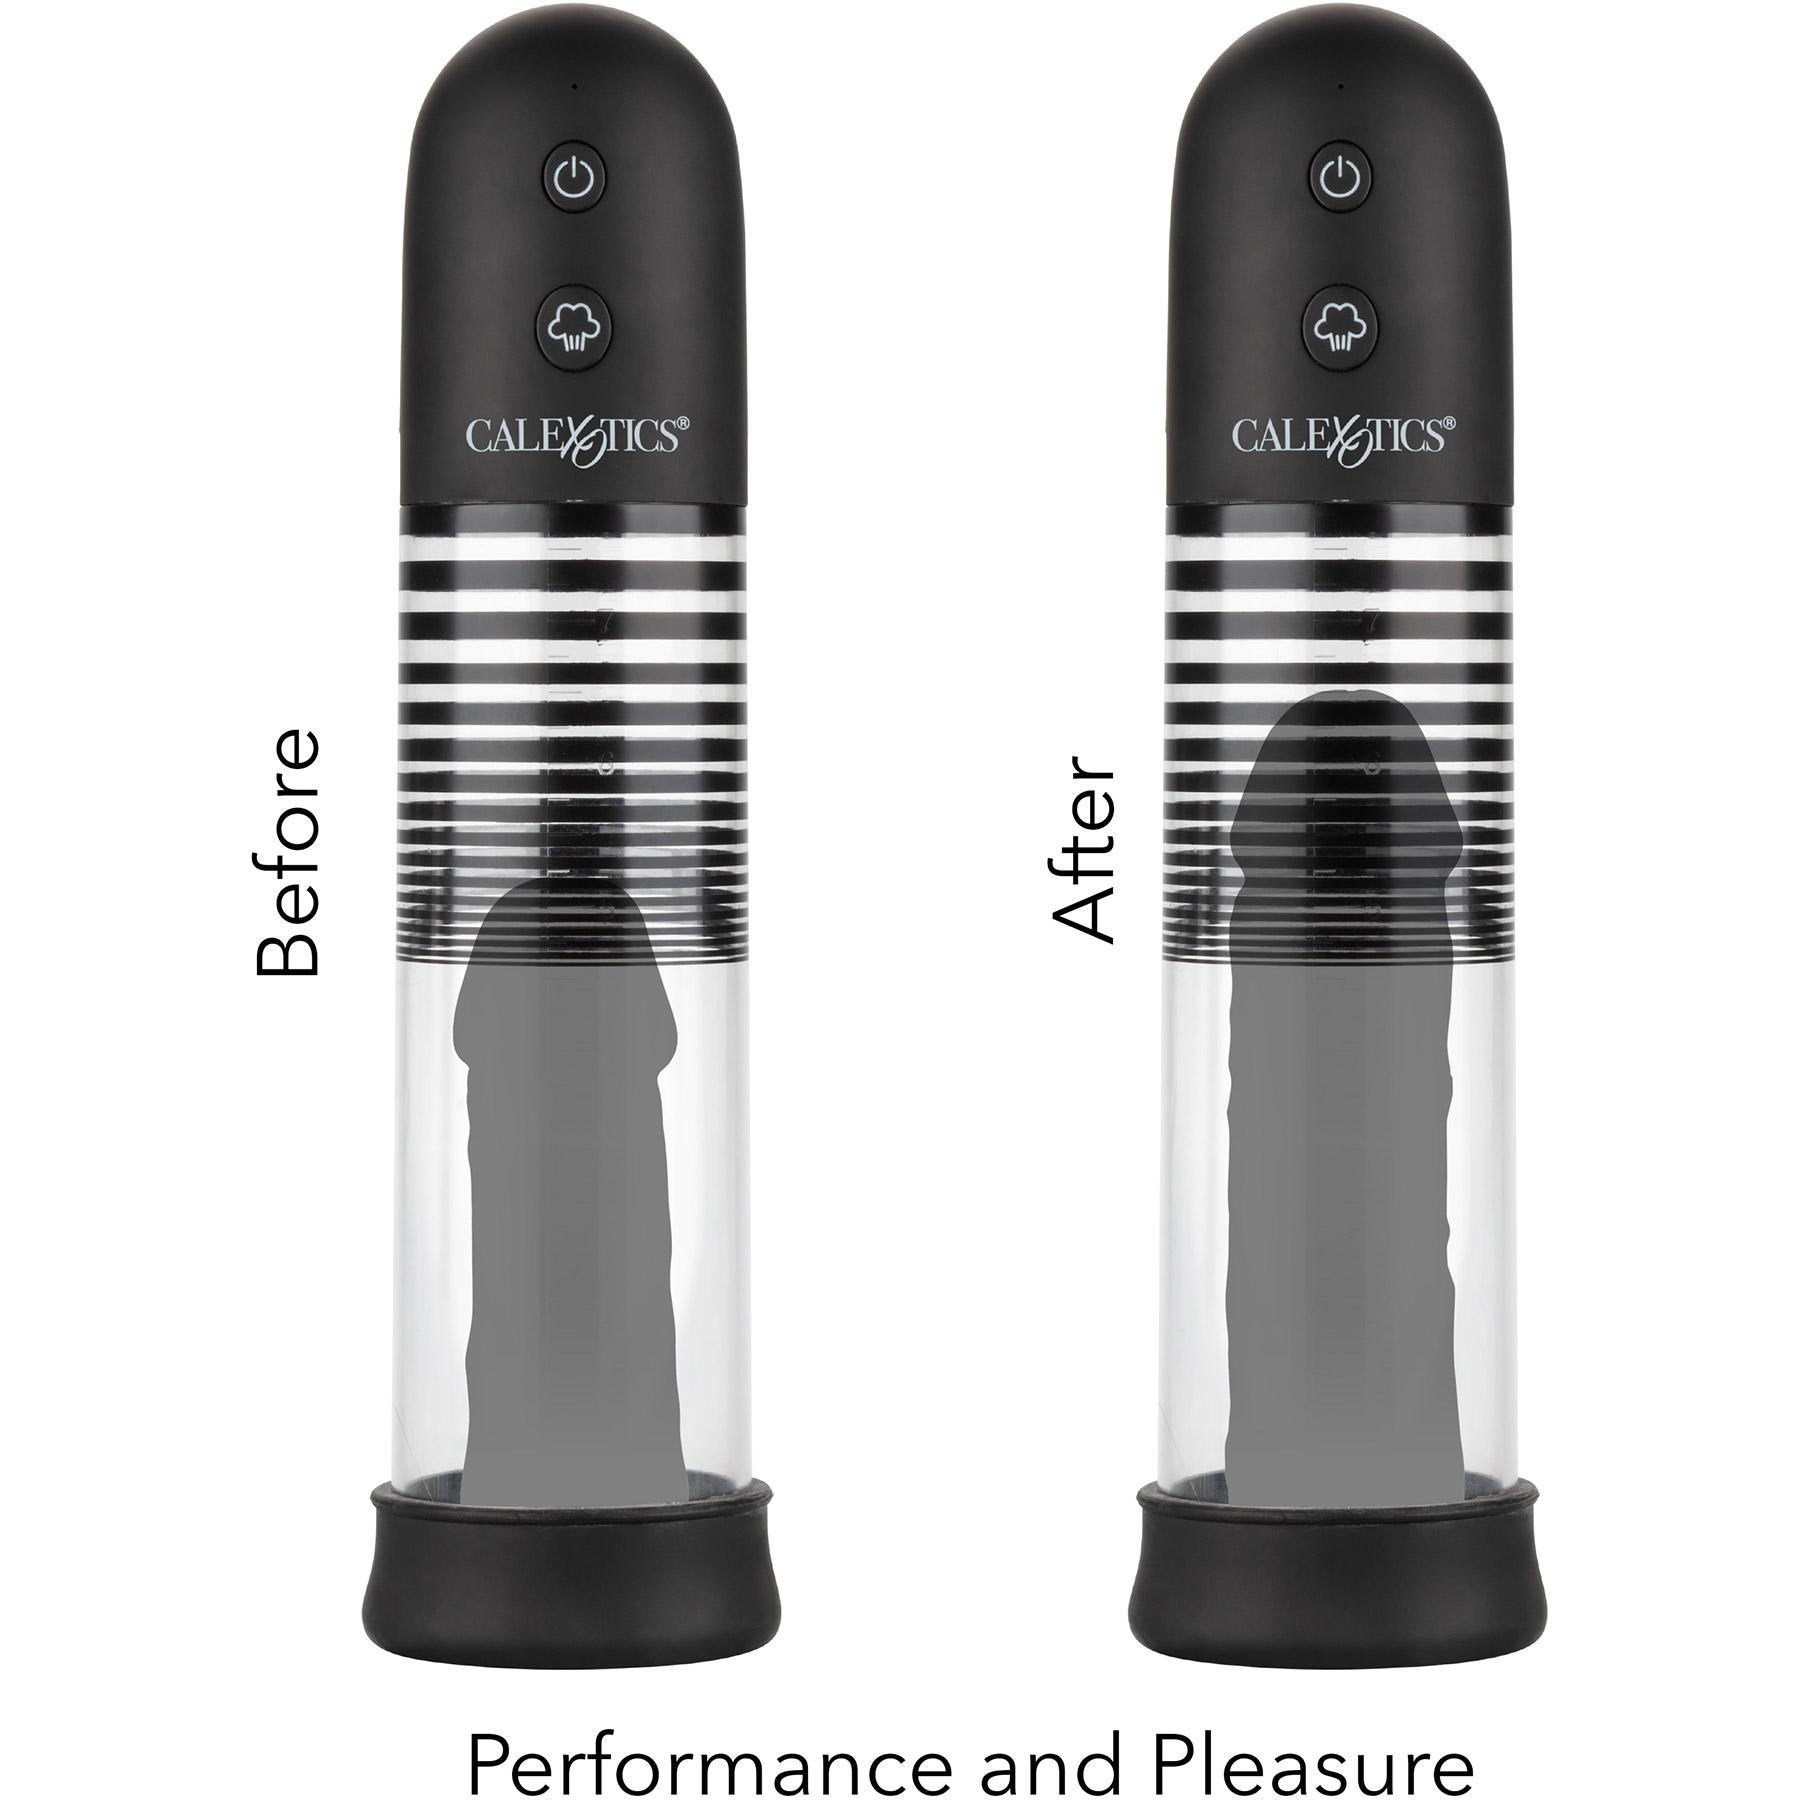 Optimum Series Rechargeable EZ Penis Pump Kit - Results